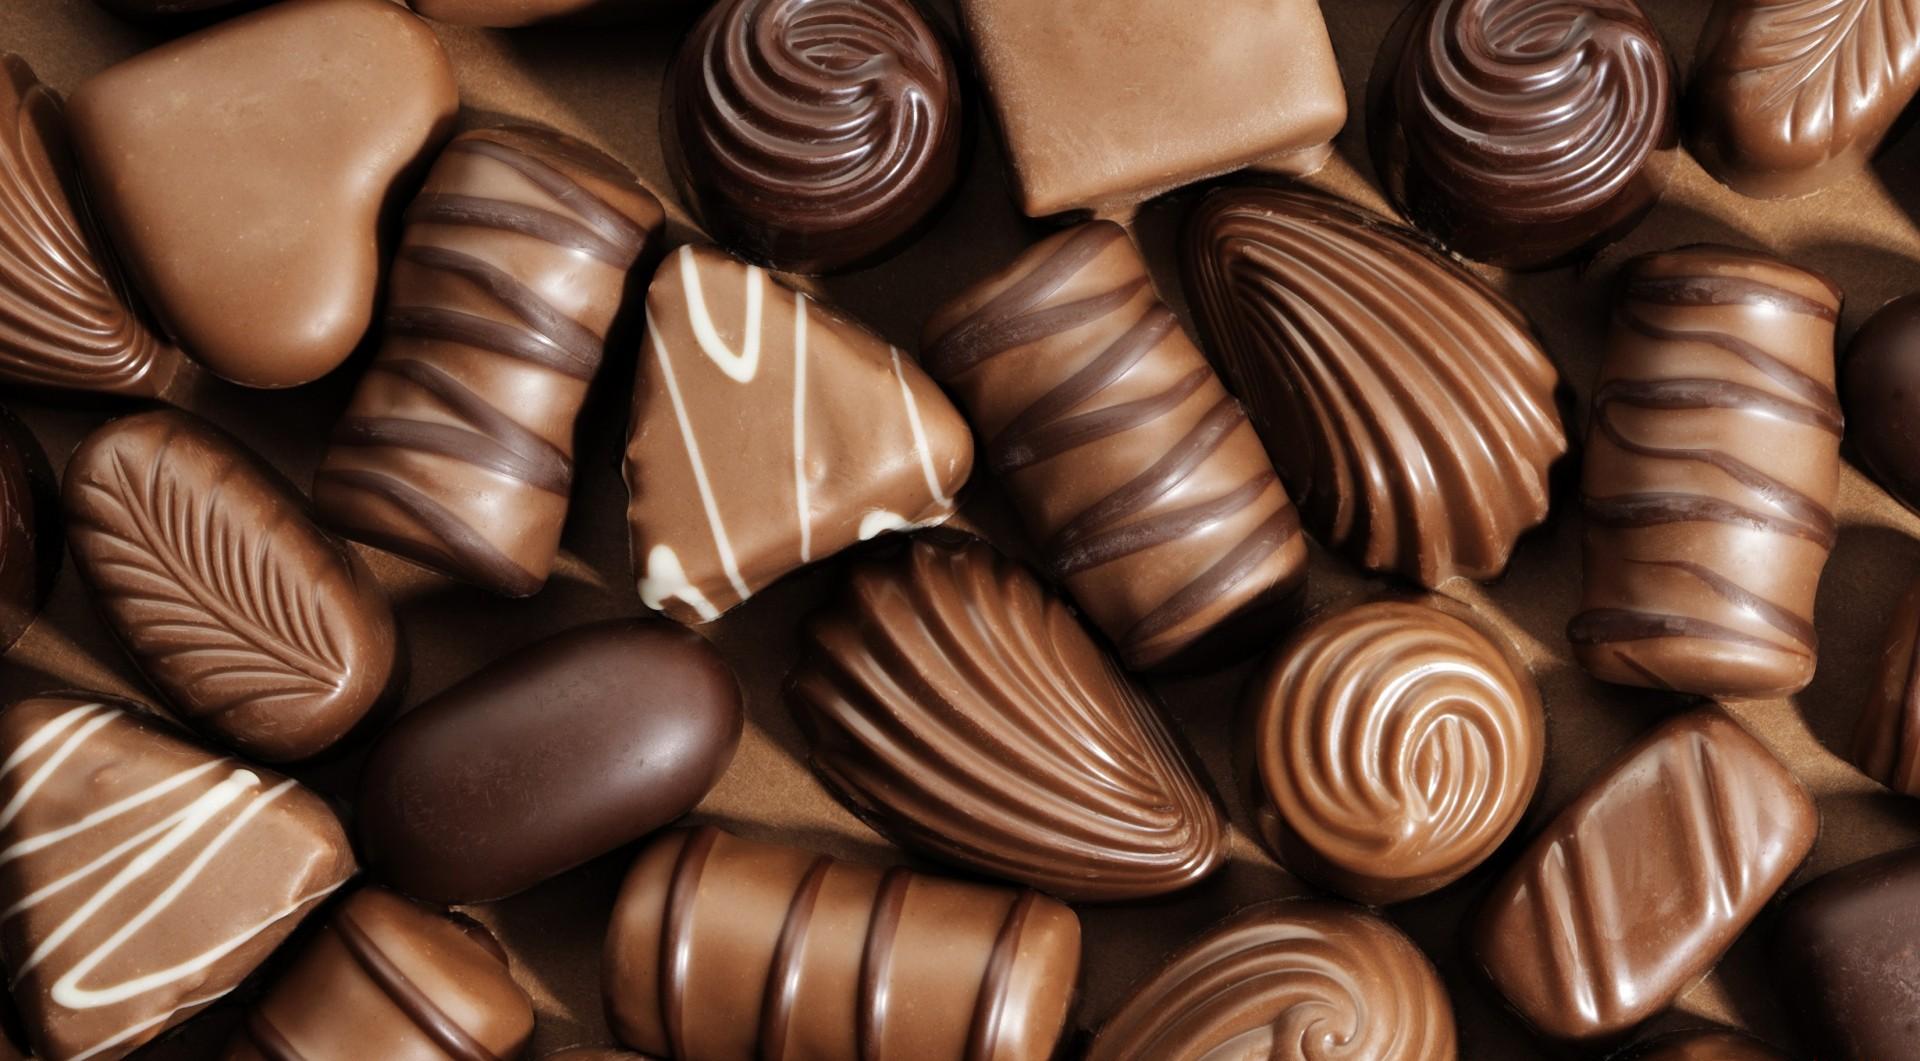 national chocolate day | Foodimentary - National Food Holidays